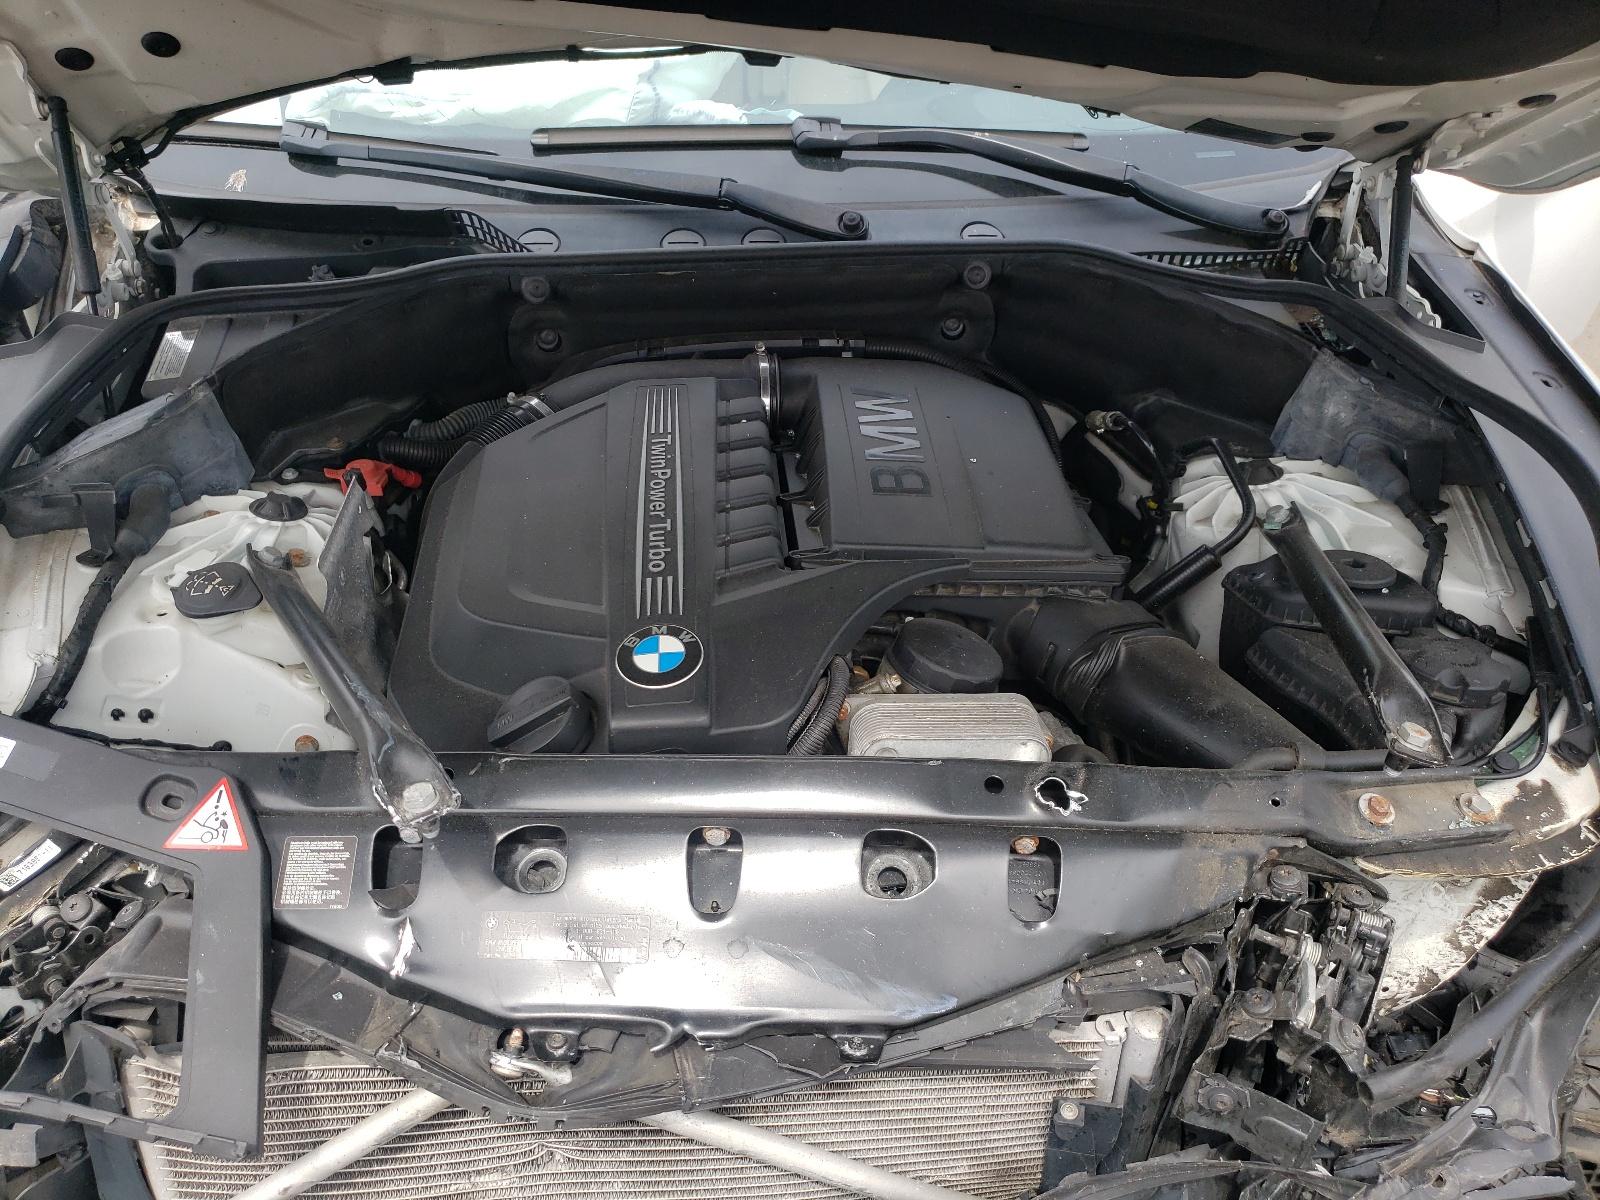 BMW 535 Xigt 2013 VIN WBASP2C58DC339050